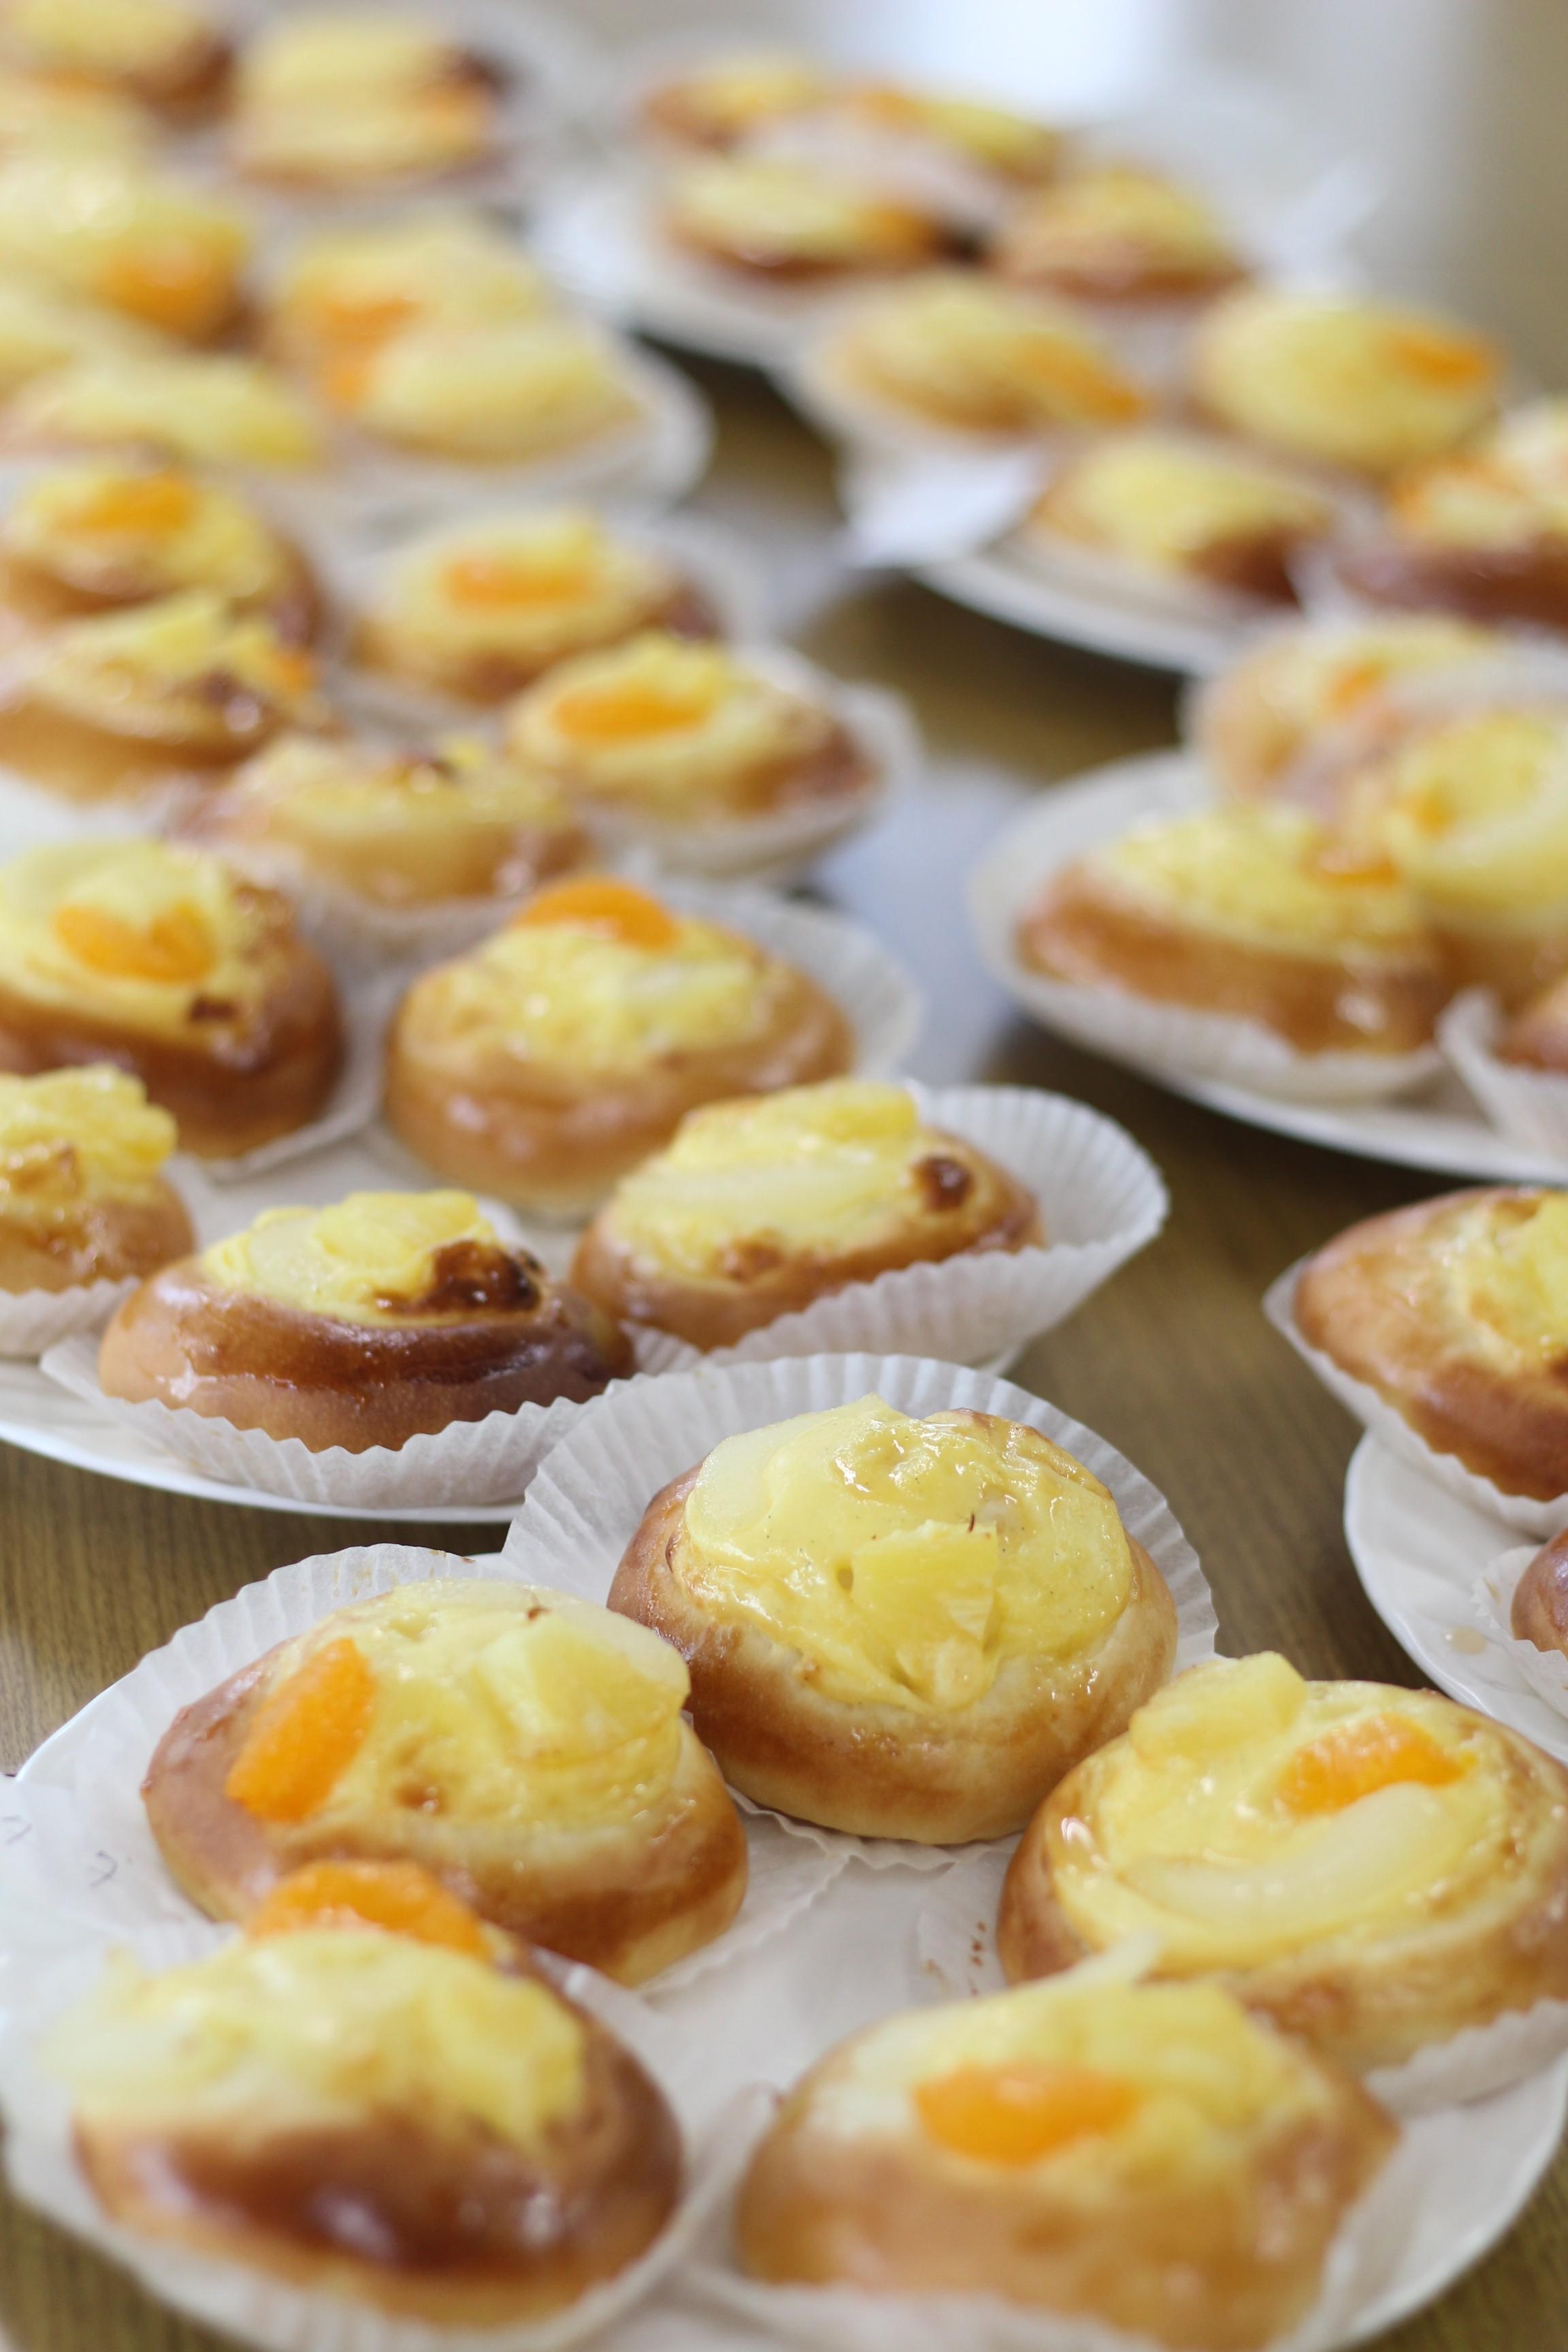 a-ta-sante糖質制限パン料理教室。阿倍野区西田辺。会館でのレッスン『フルーツぱんタルト』